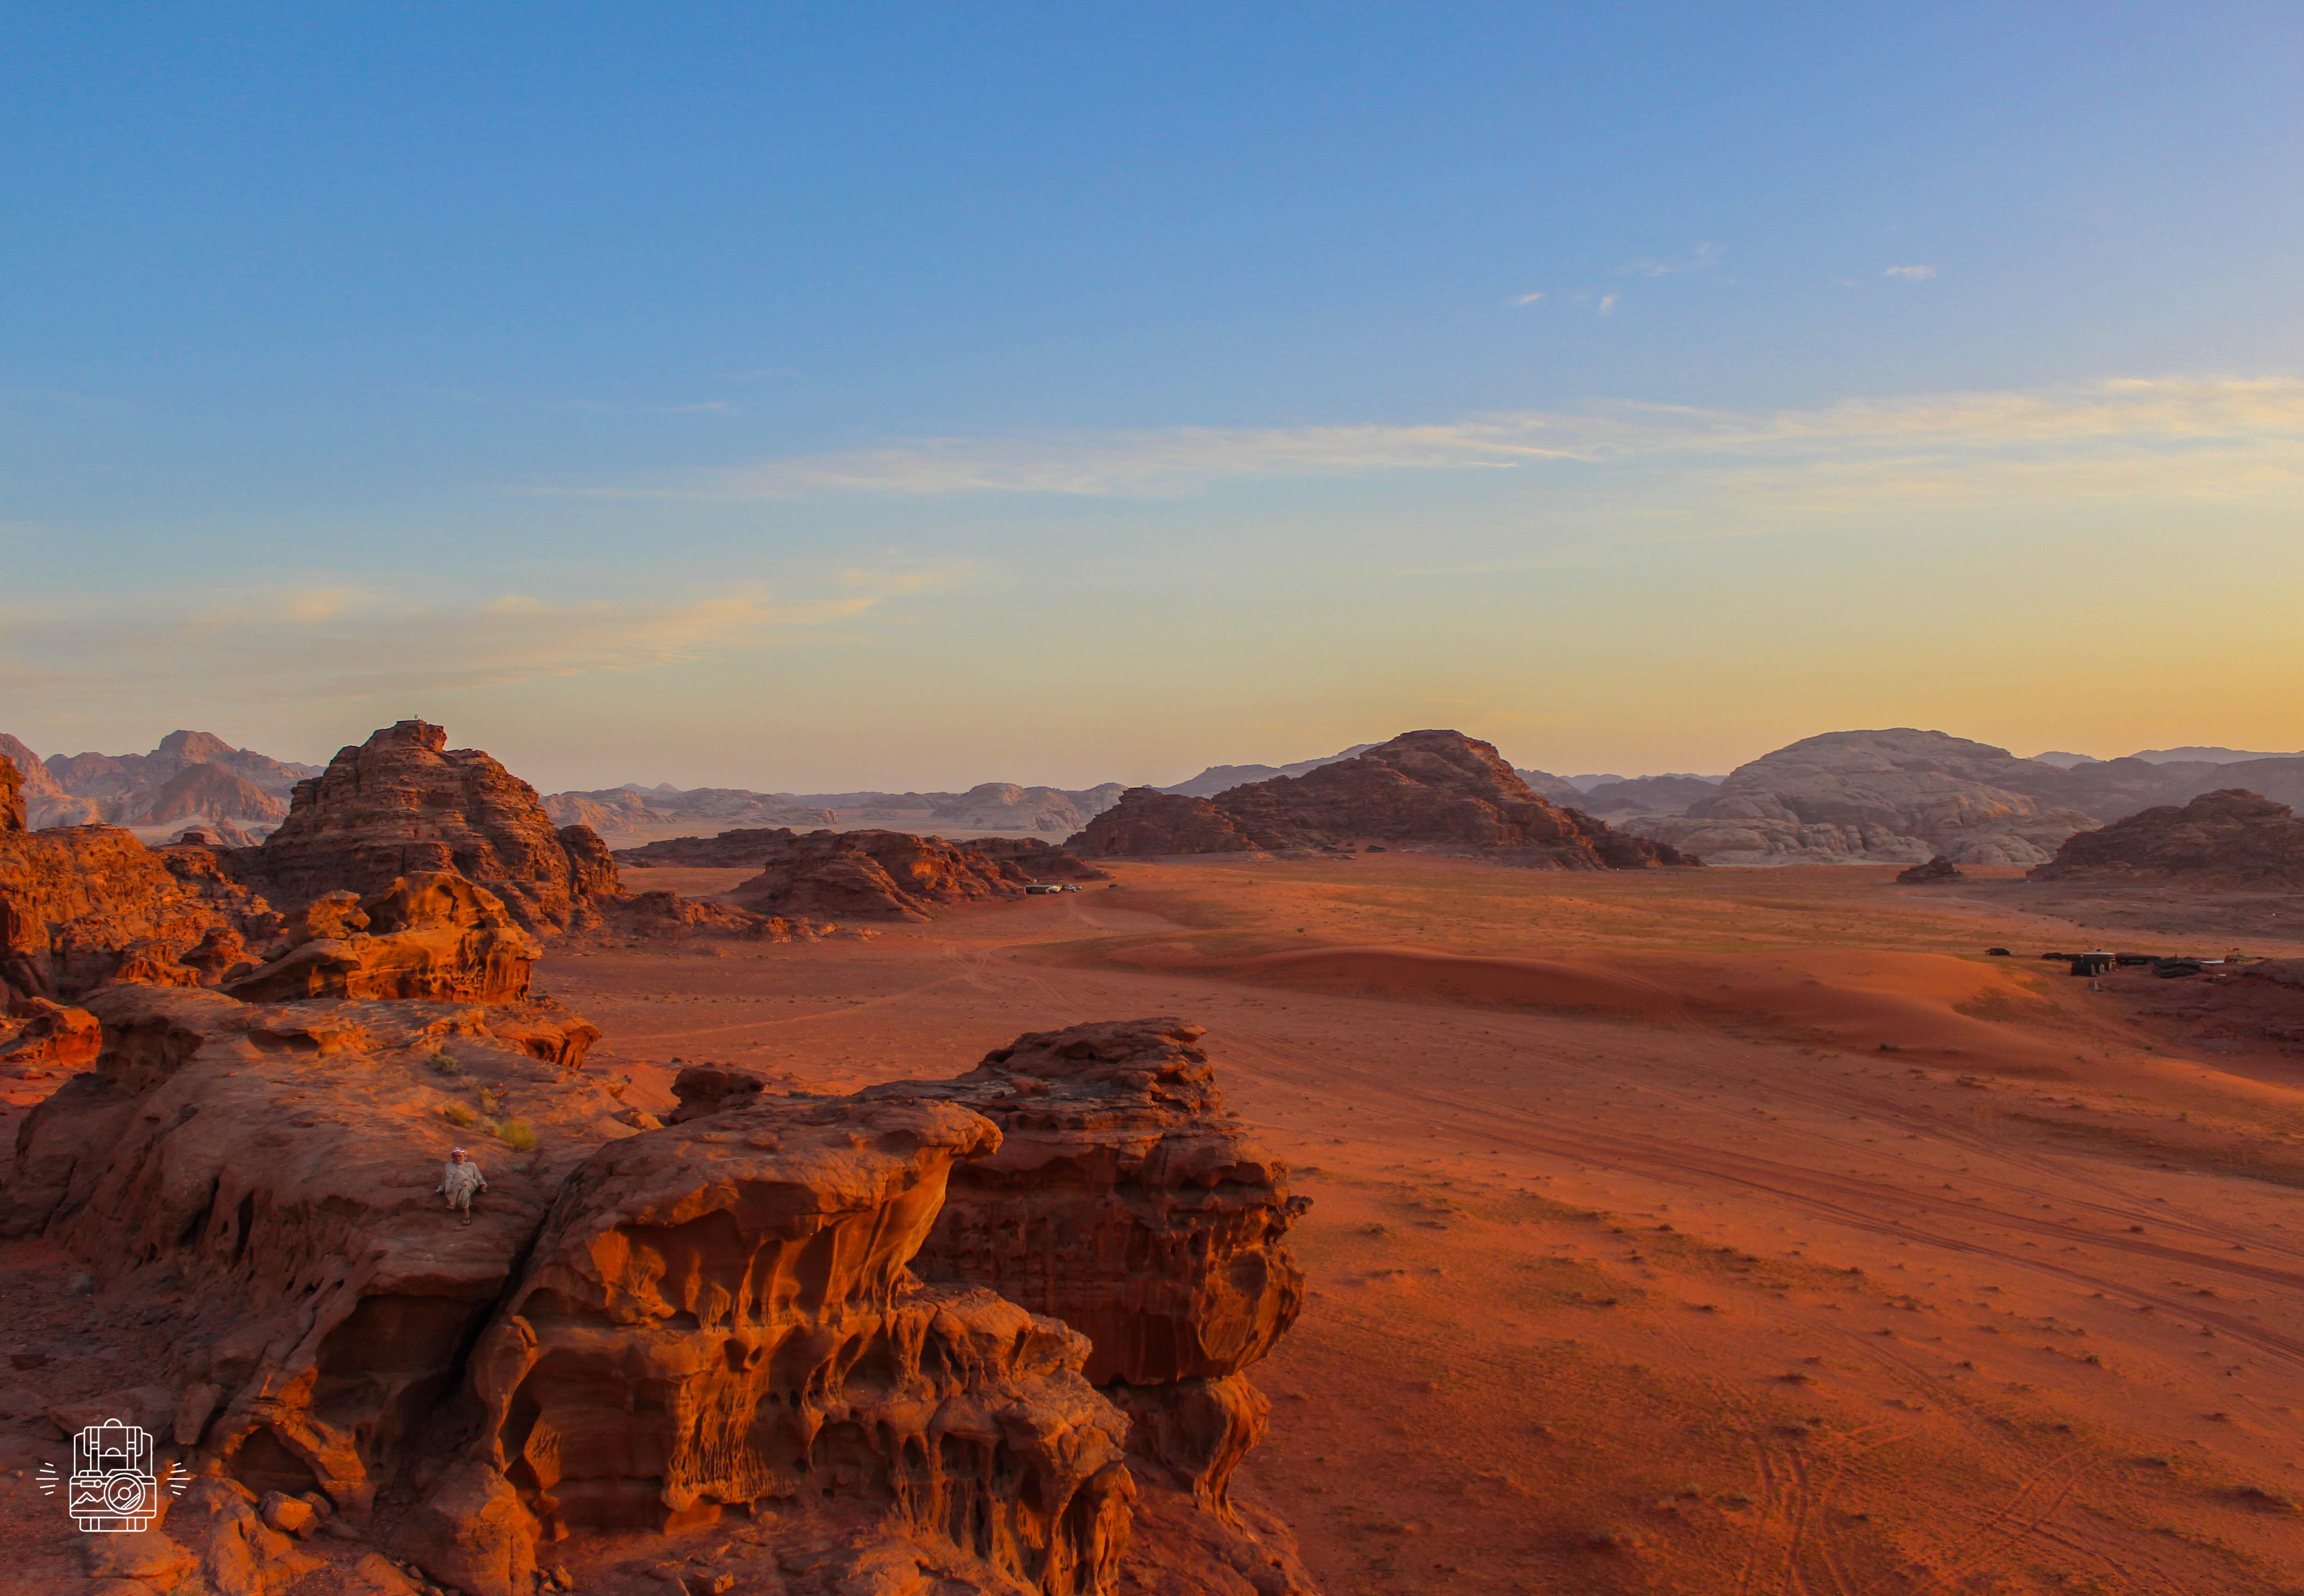 Jordanie/Wadi Rum